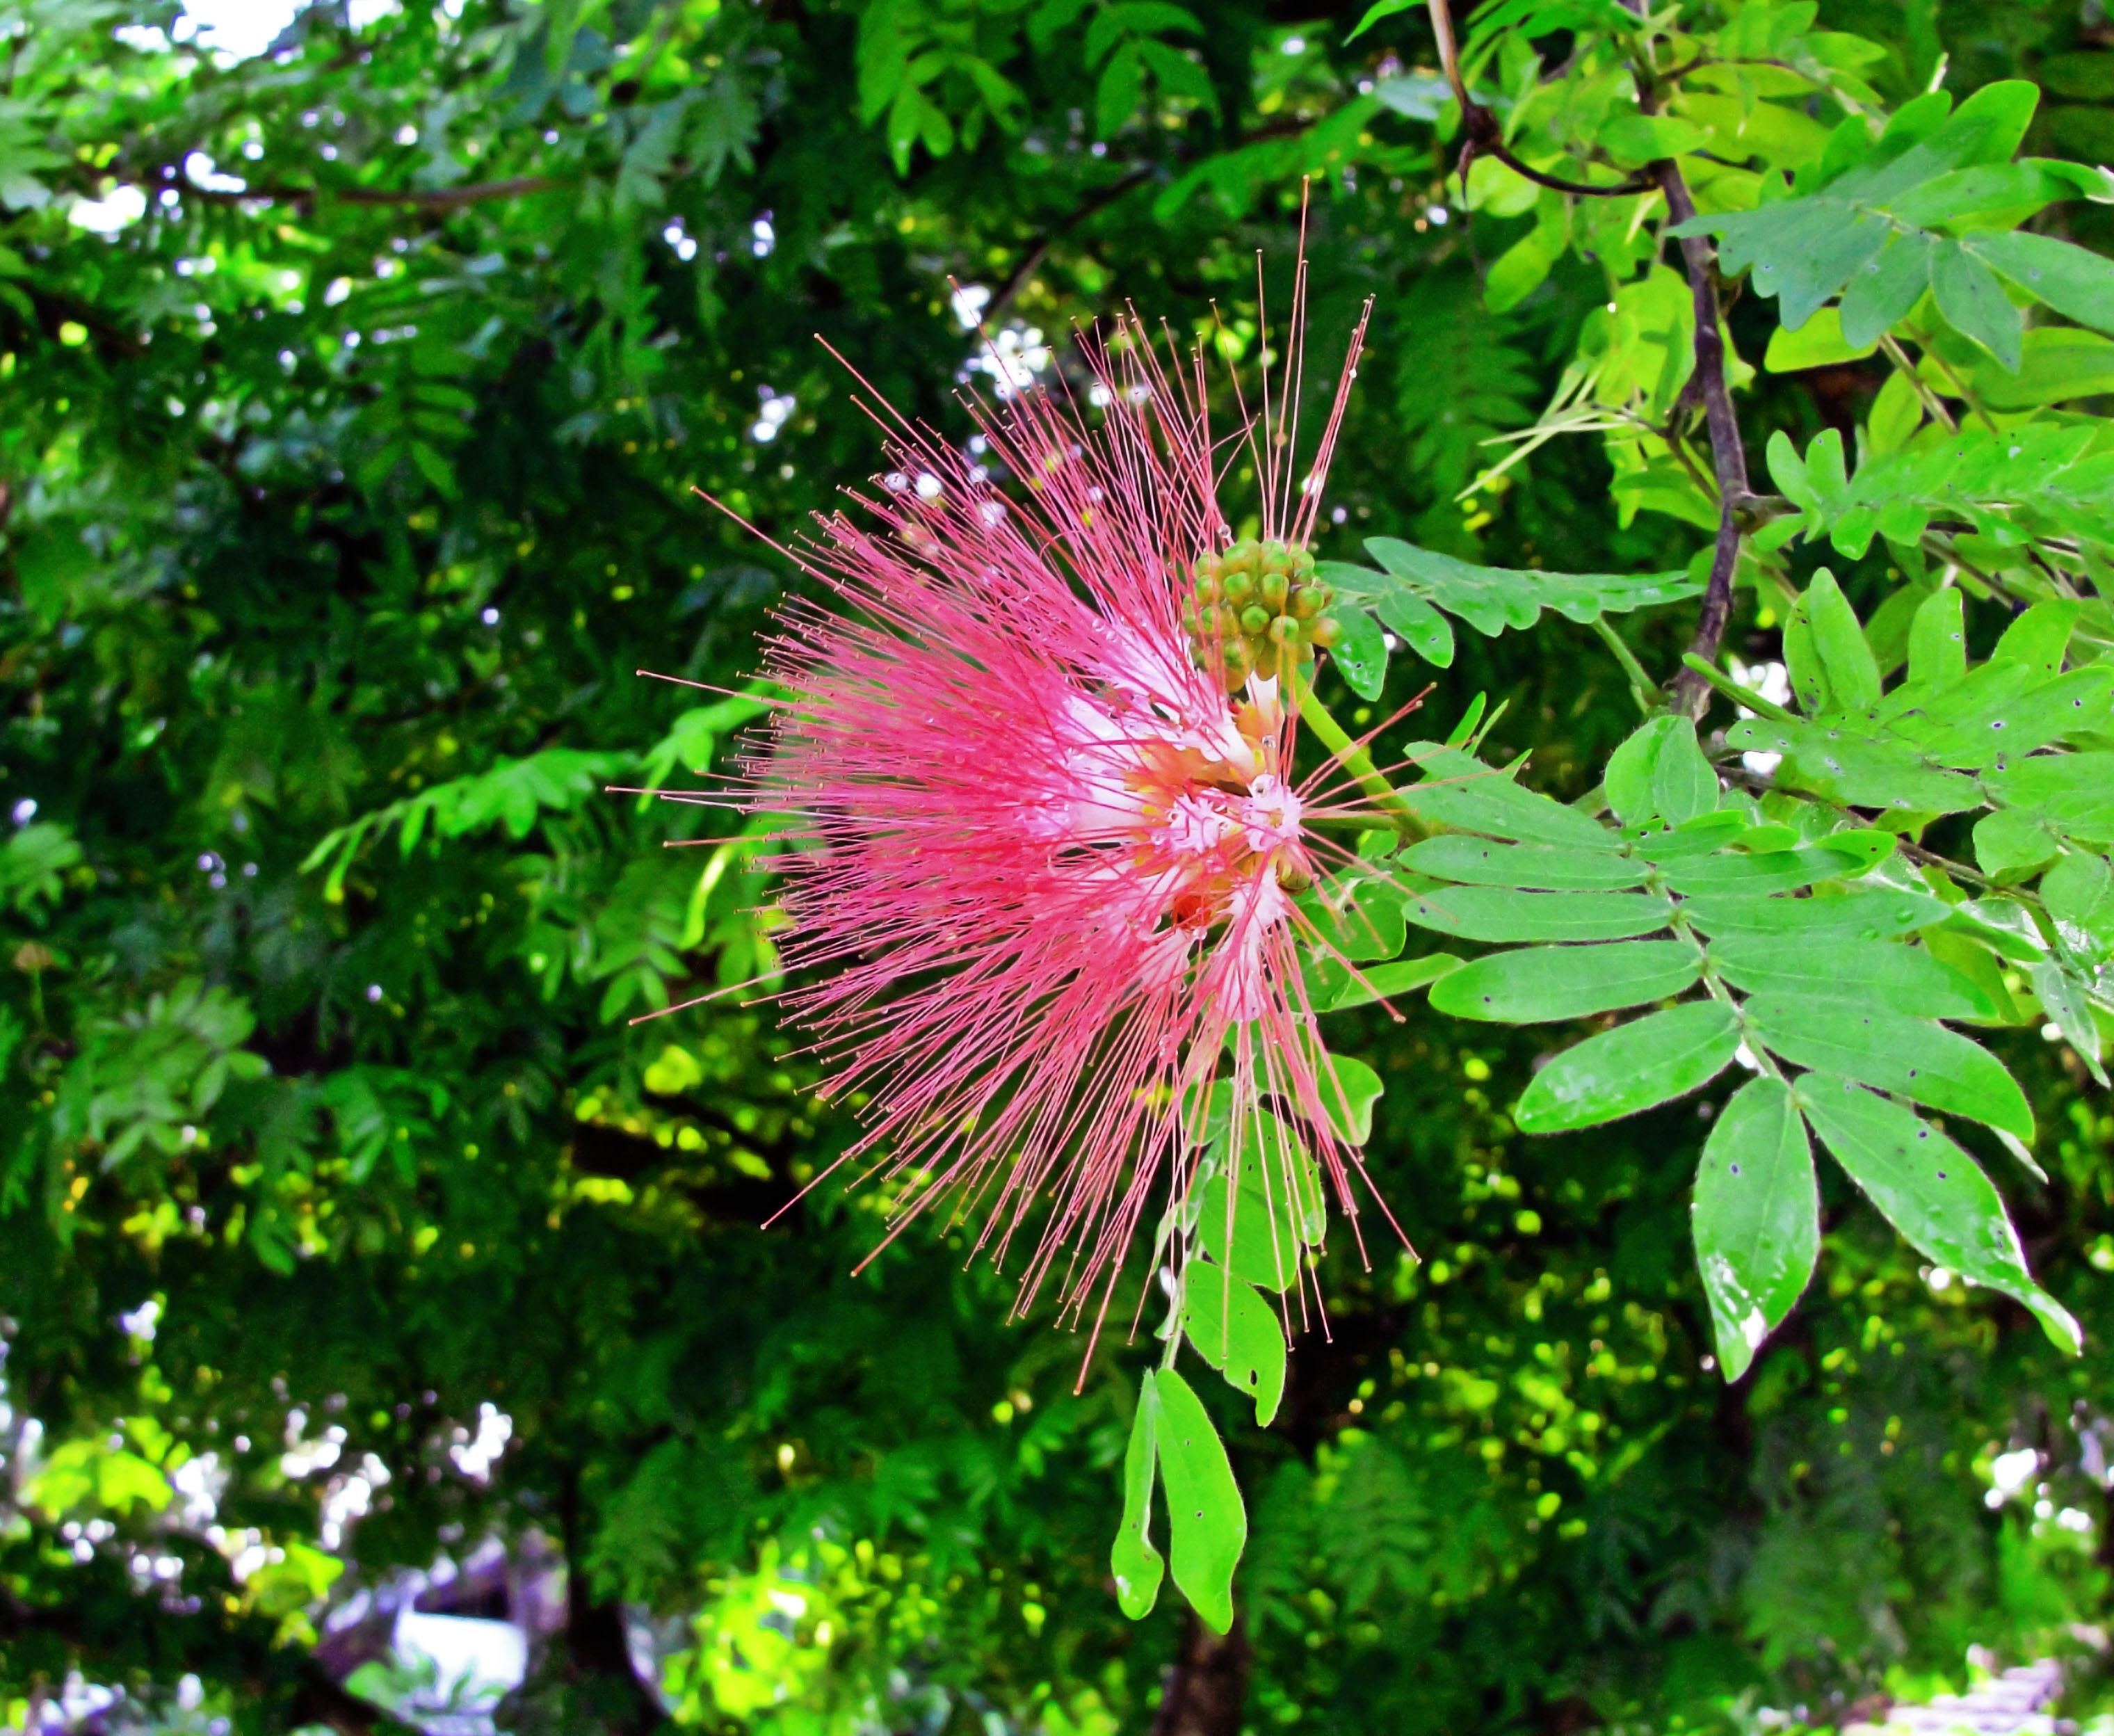 Free Images Leaf Botany Flora Wildflower Shrub Mimosa